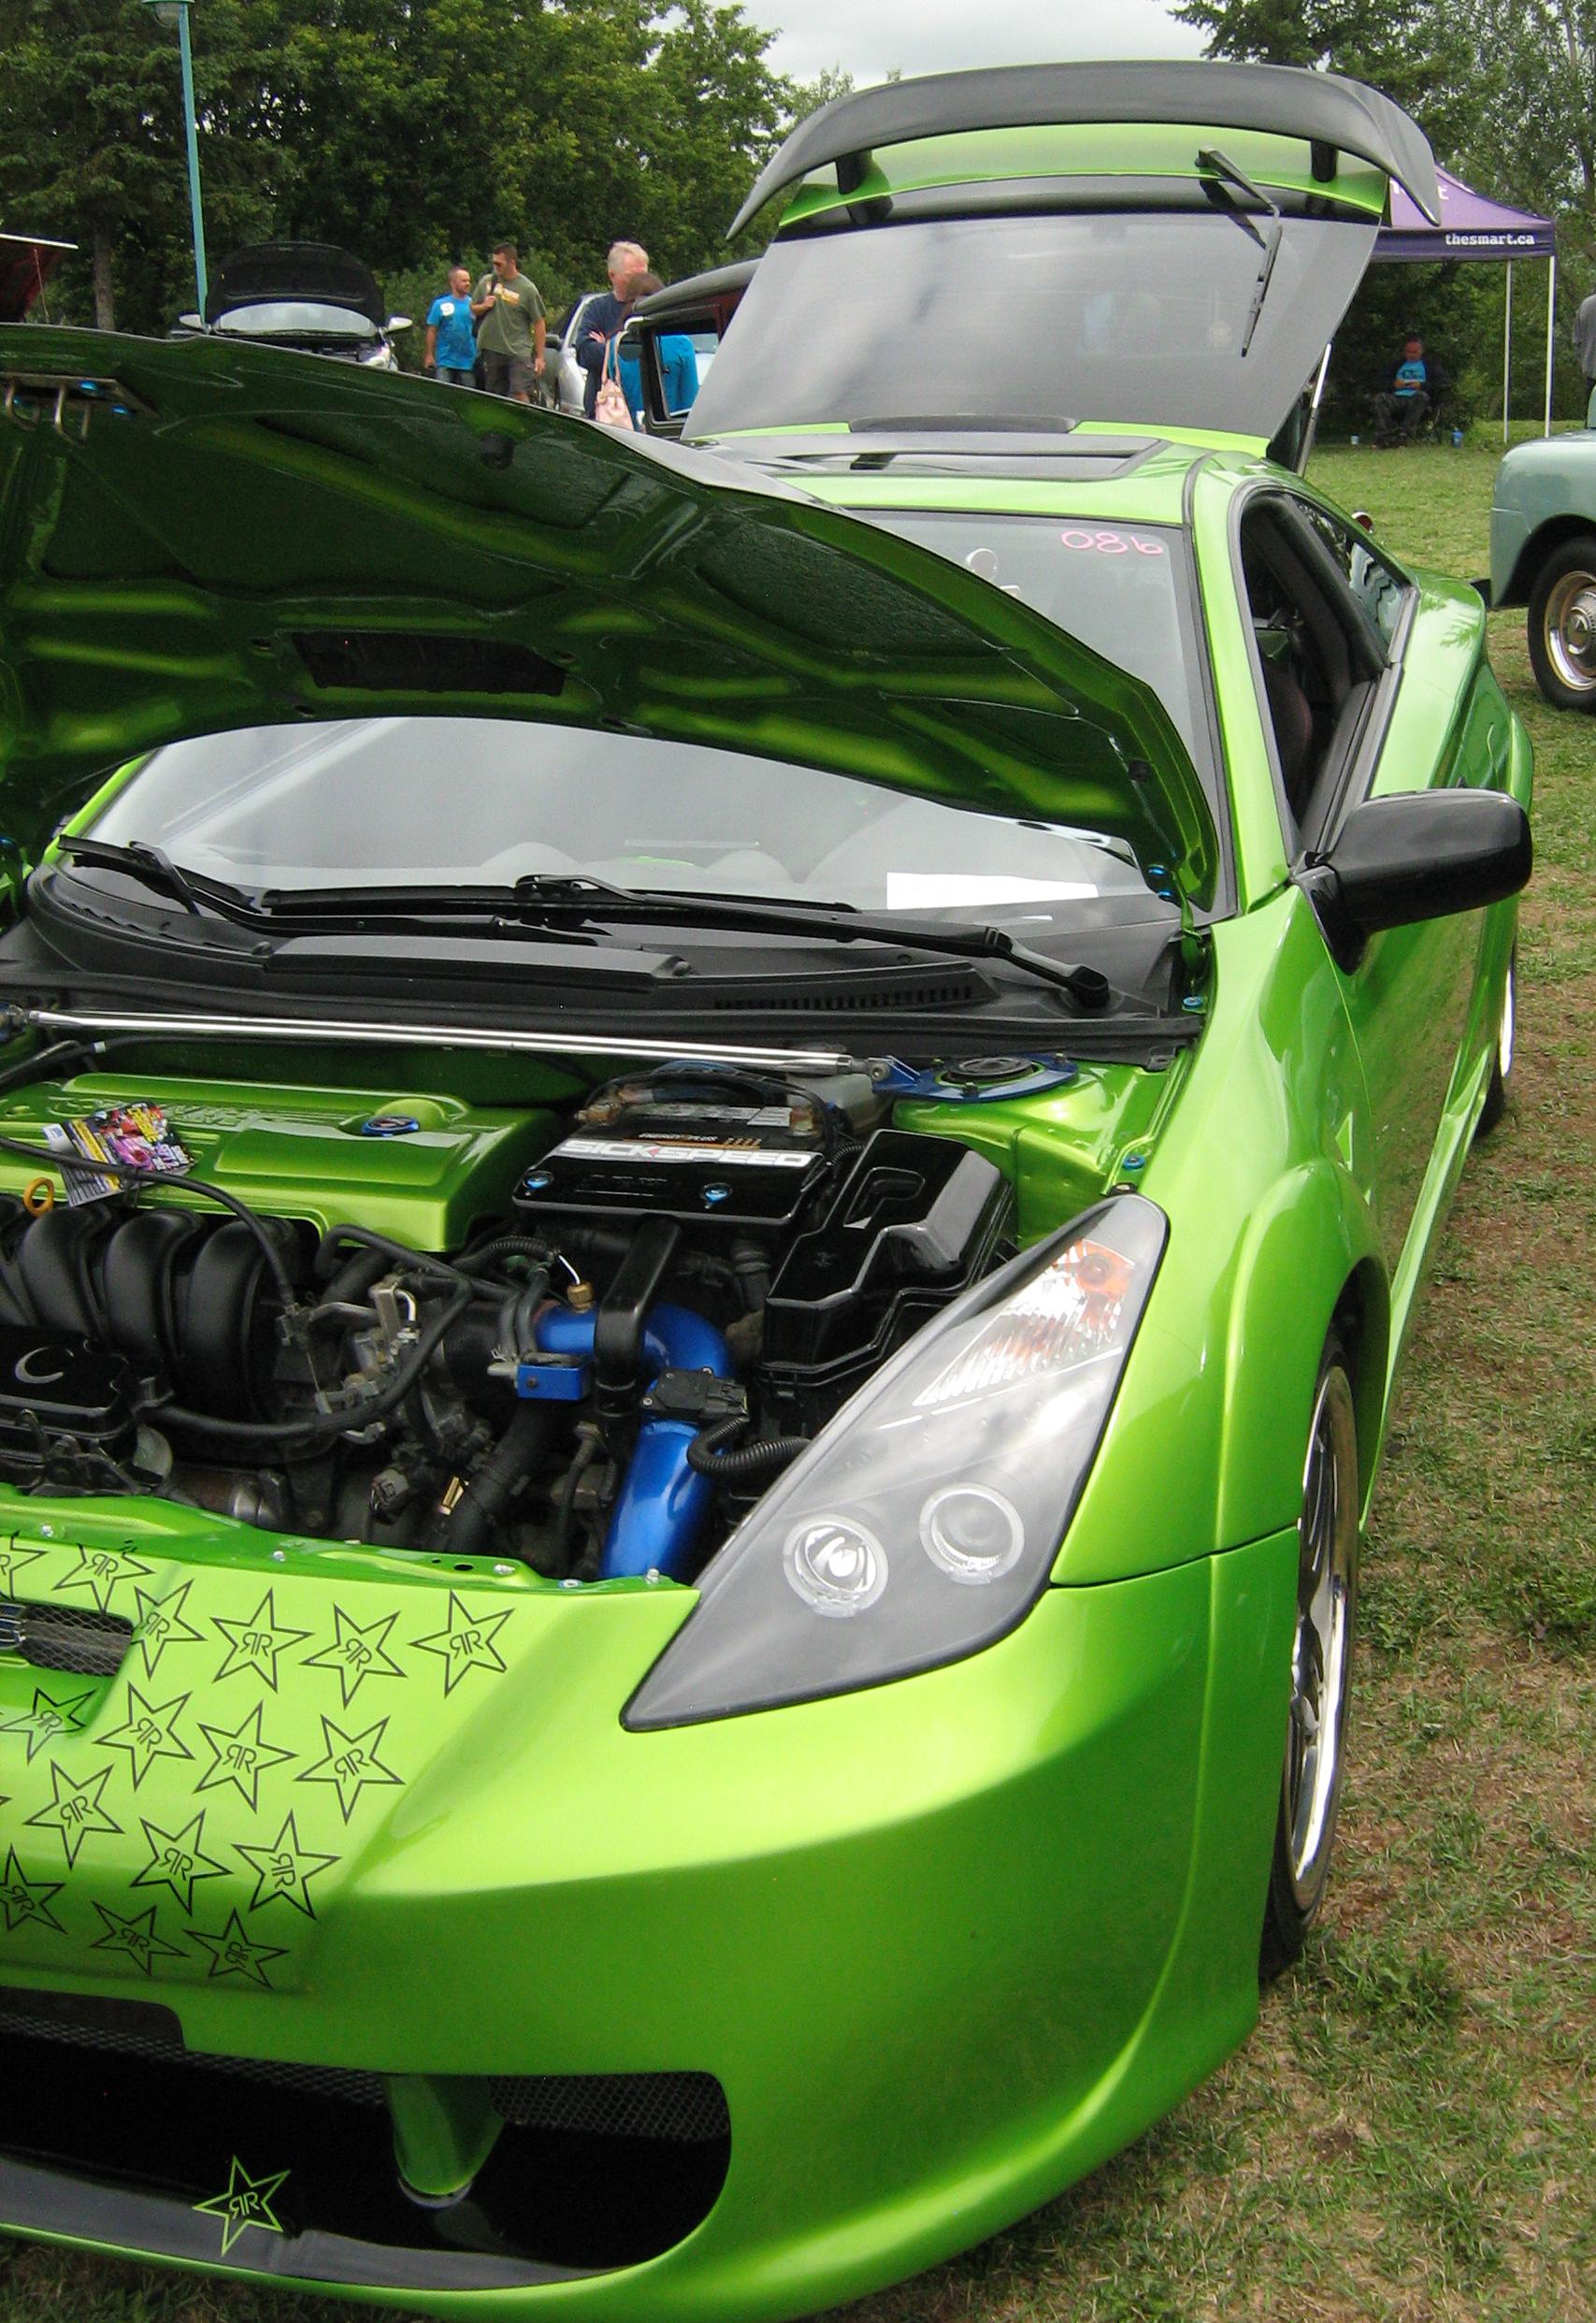 TOYOTA CELICA green